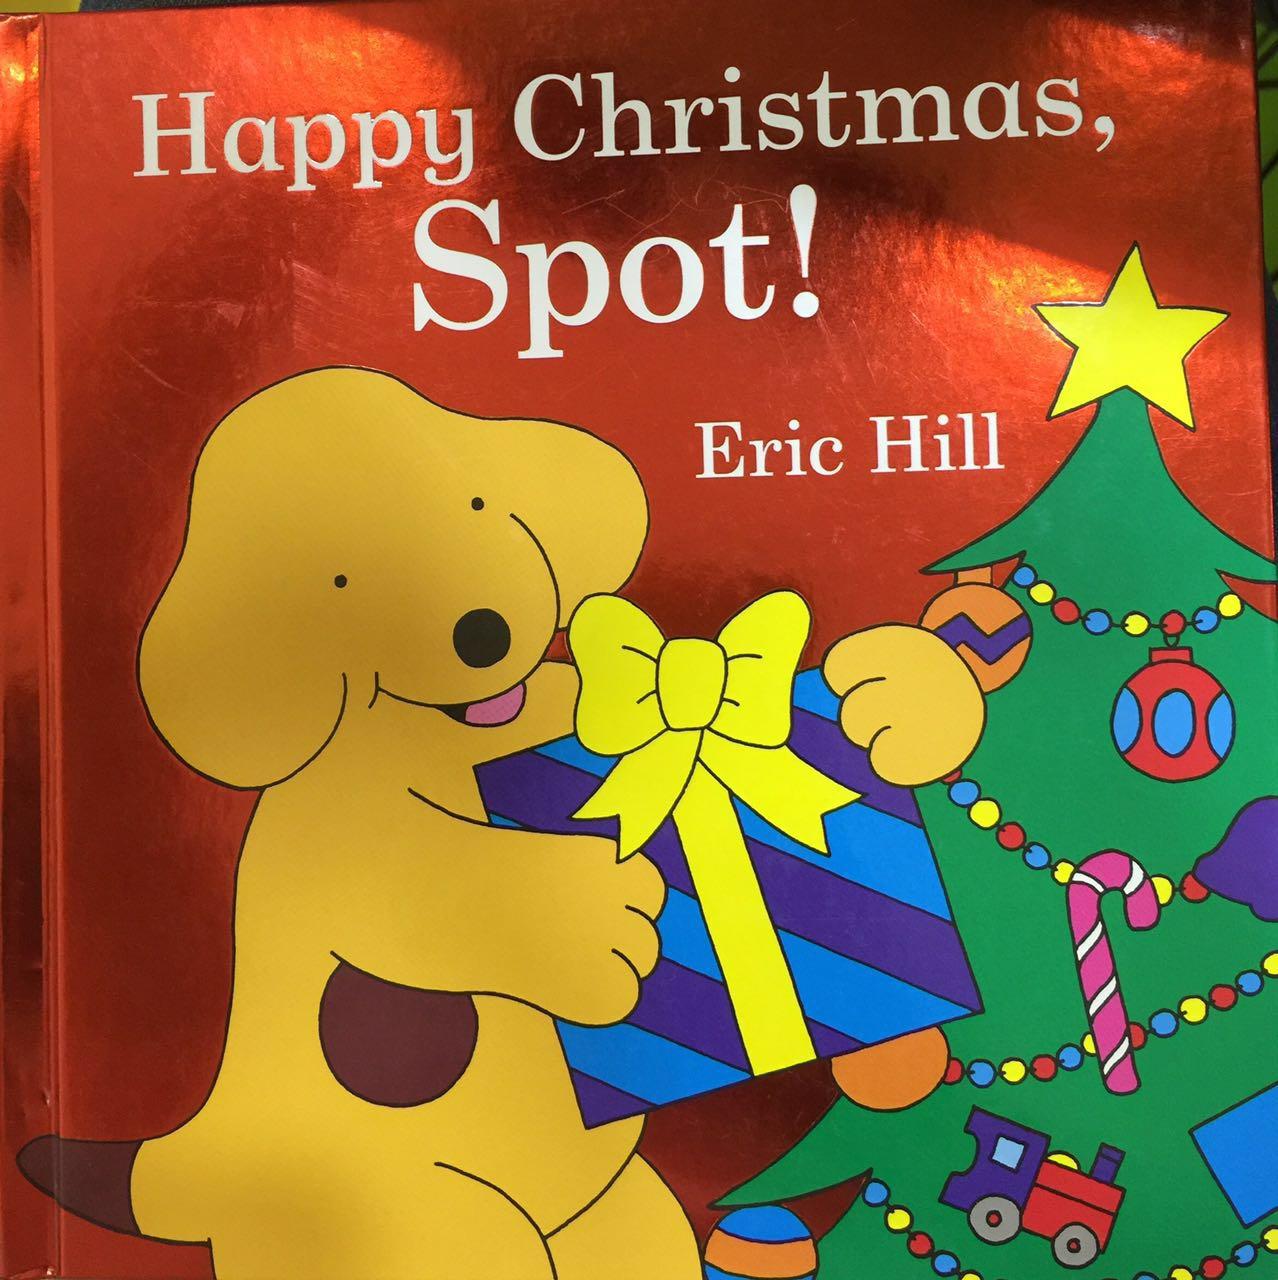 Happy Christm as, Spot! 英文原版翻翻书